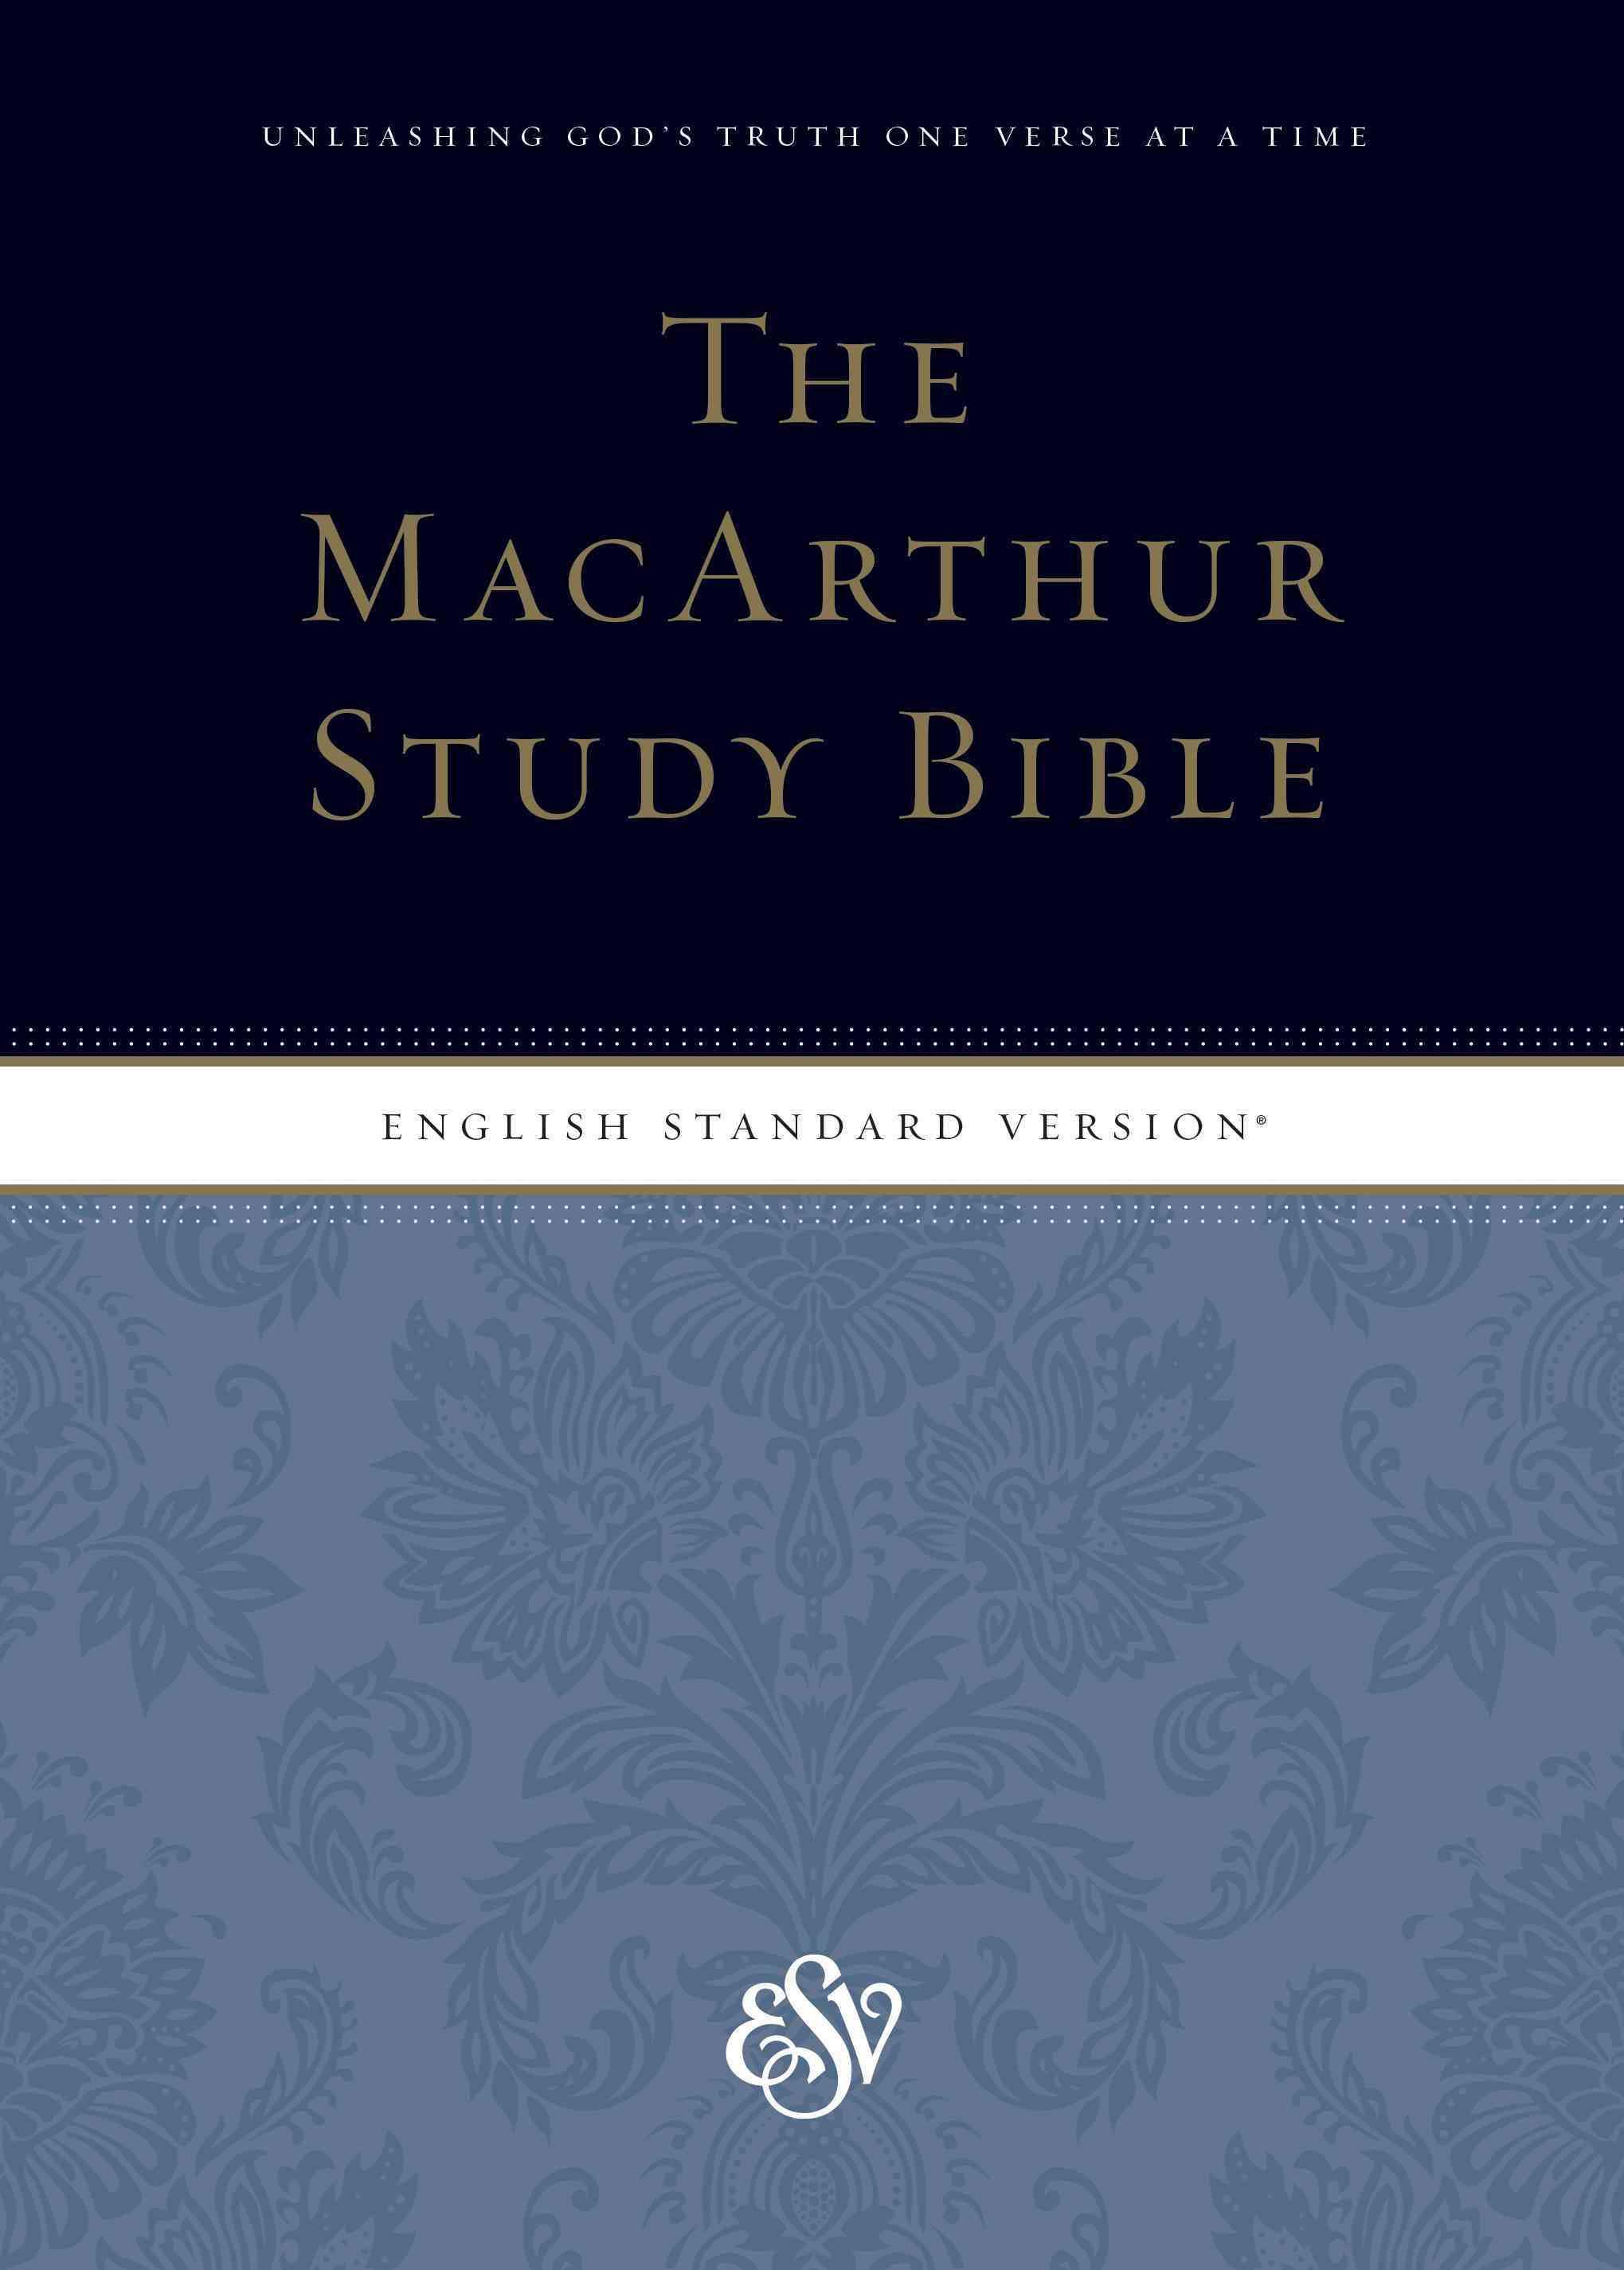 The Macarthur Study Bible: English Standard Version (Hardcover)